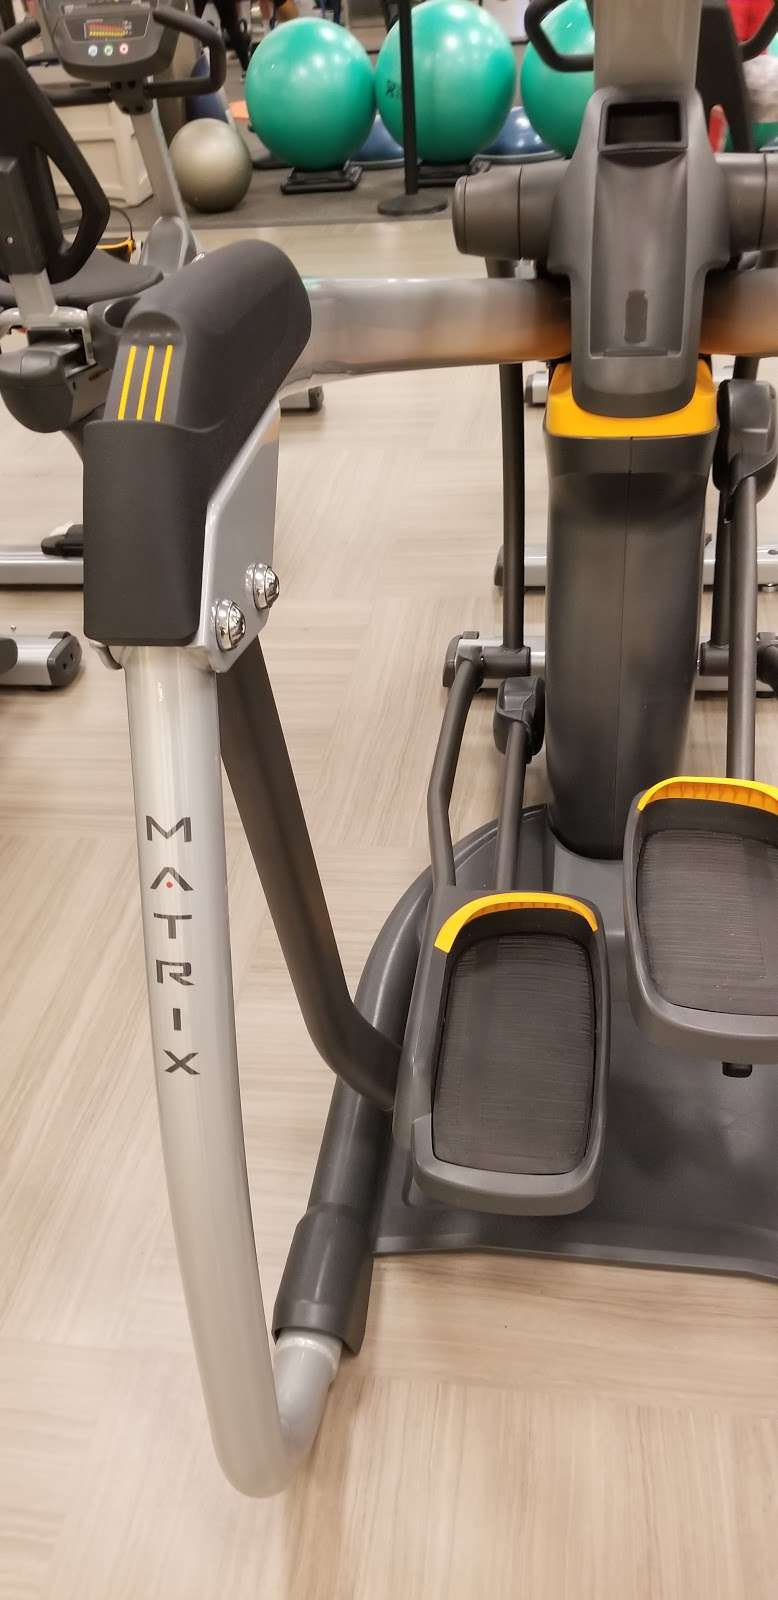 LA Fitness - gym  | Photo 6 of 10 | Address: 7 Cabot Blvd E, Langhorne, PA 19047, USA | Phone: (215) 943-9500